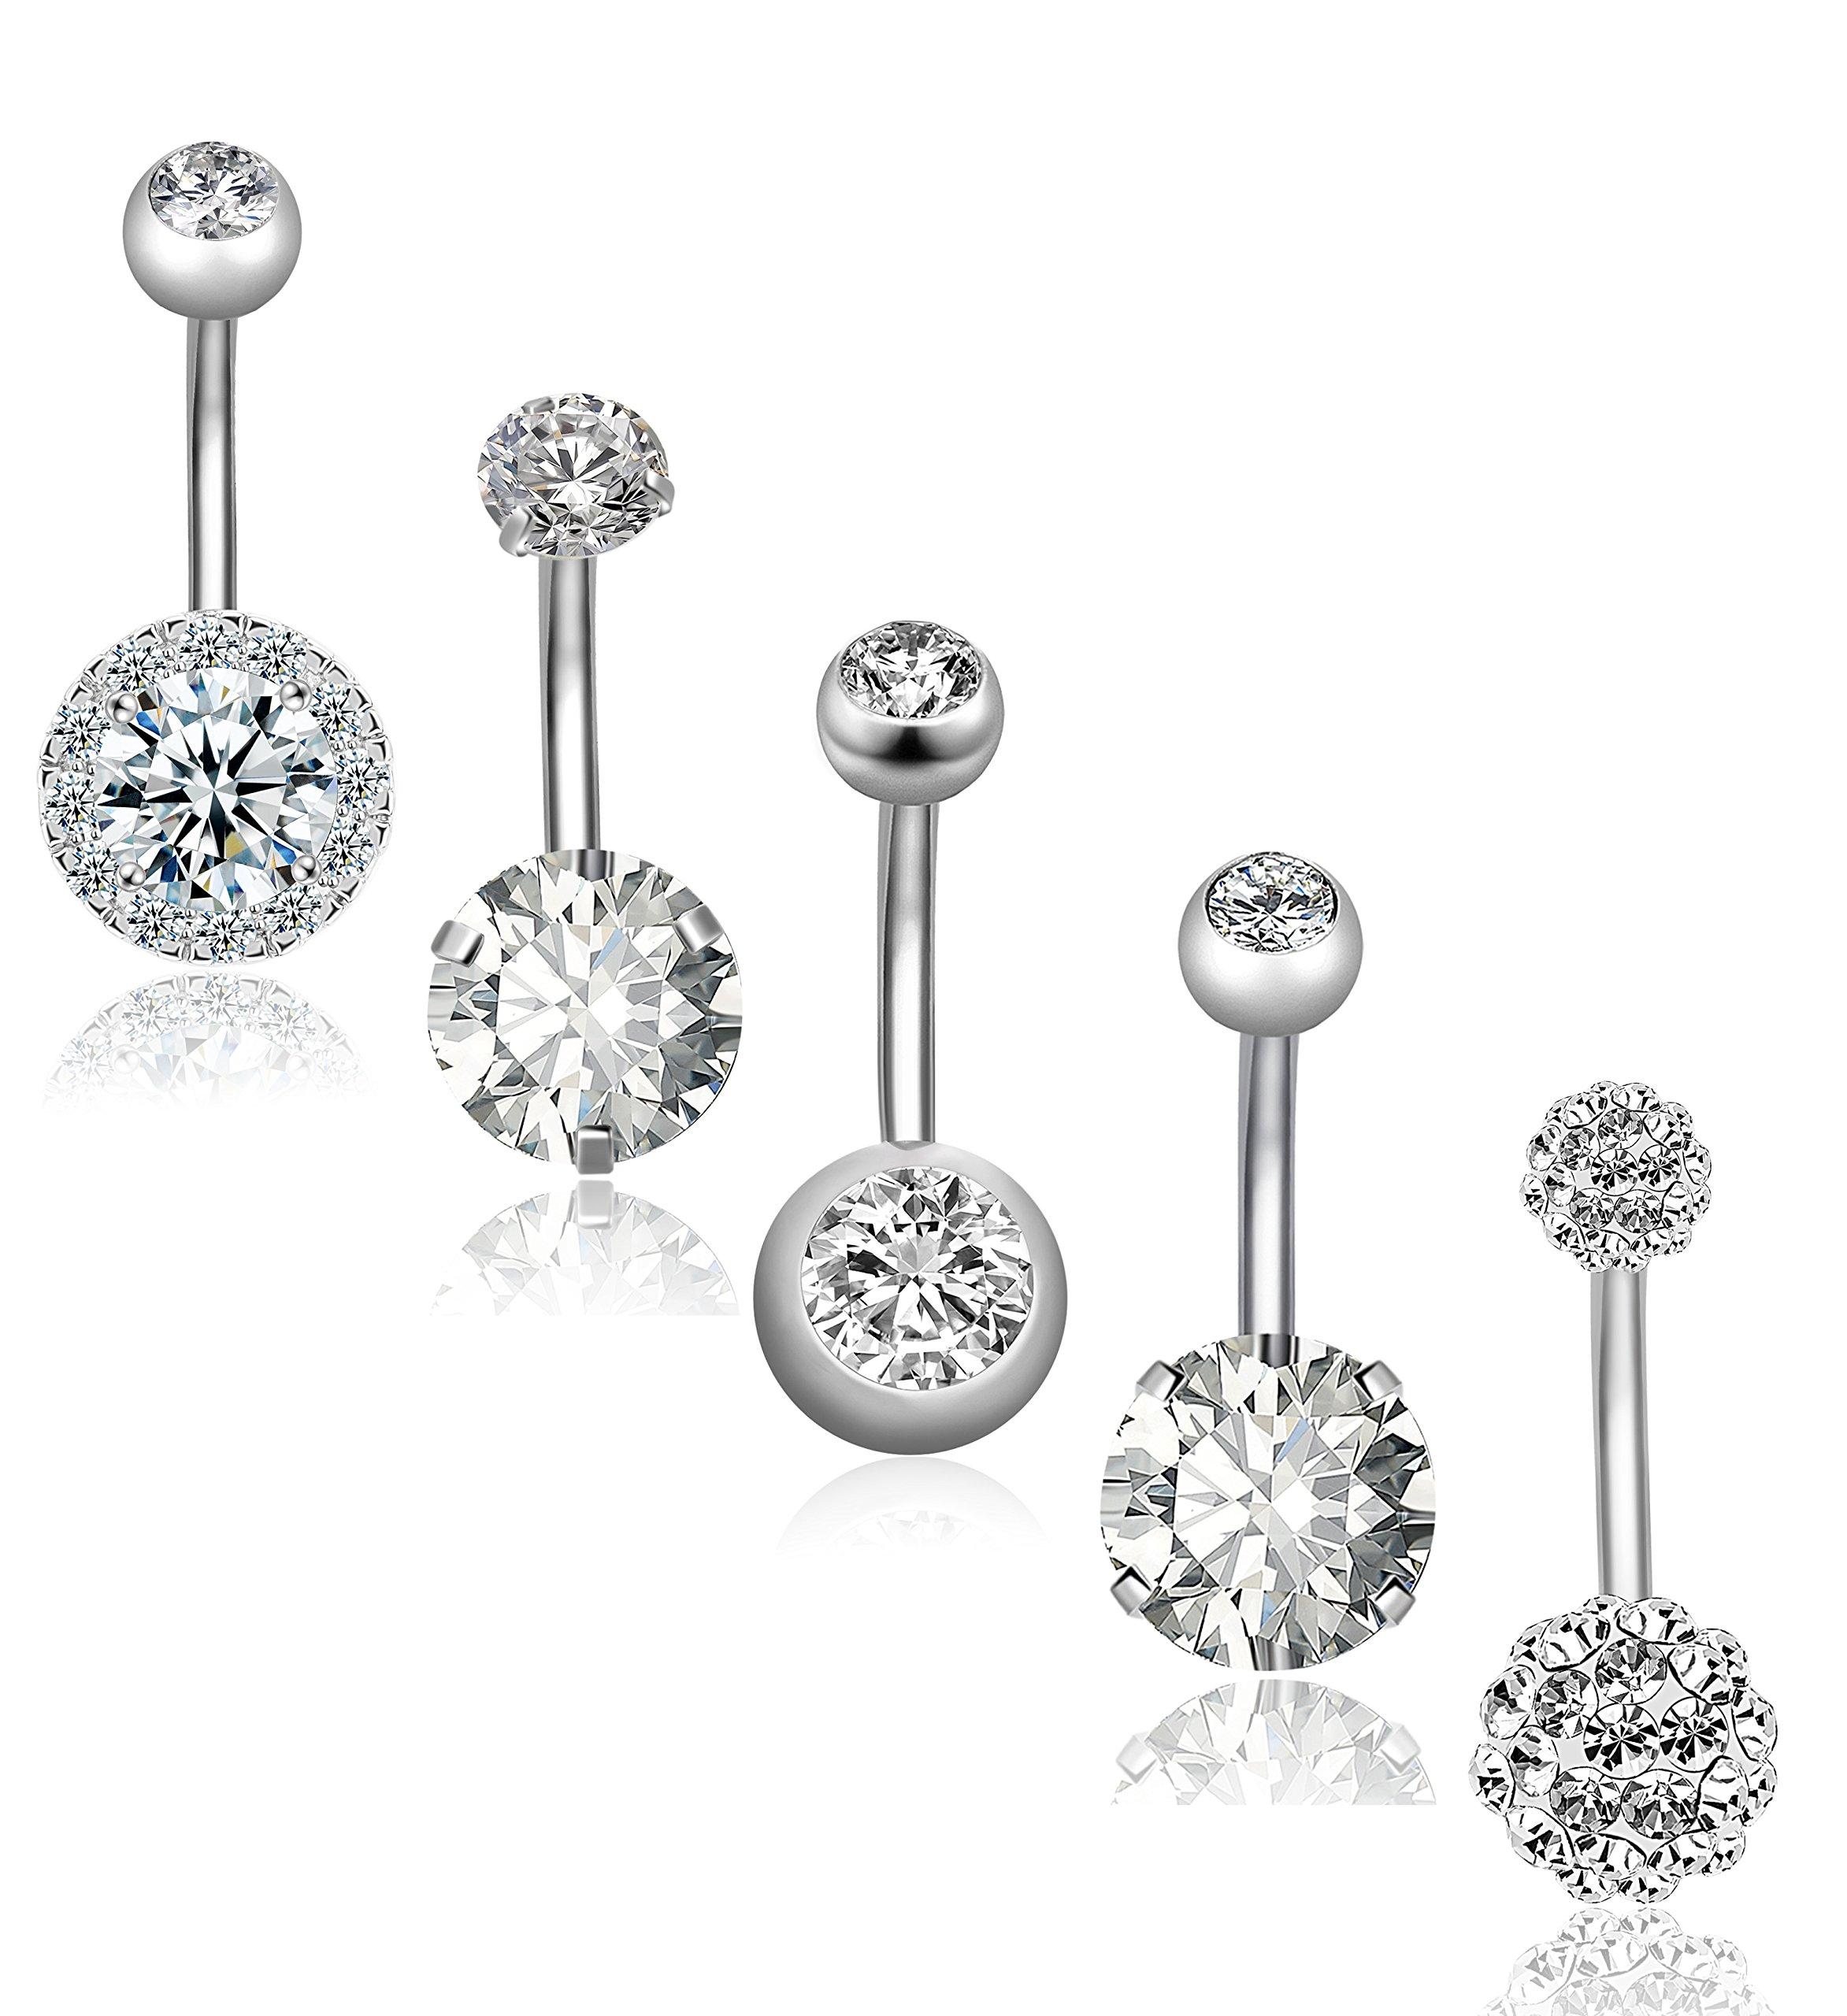 REVOLIA 5Pcs 14G Stainless Steel Belly Button Rings for Women Girls Navel Rings CZ Body Piercing S by REVOLIA